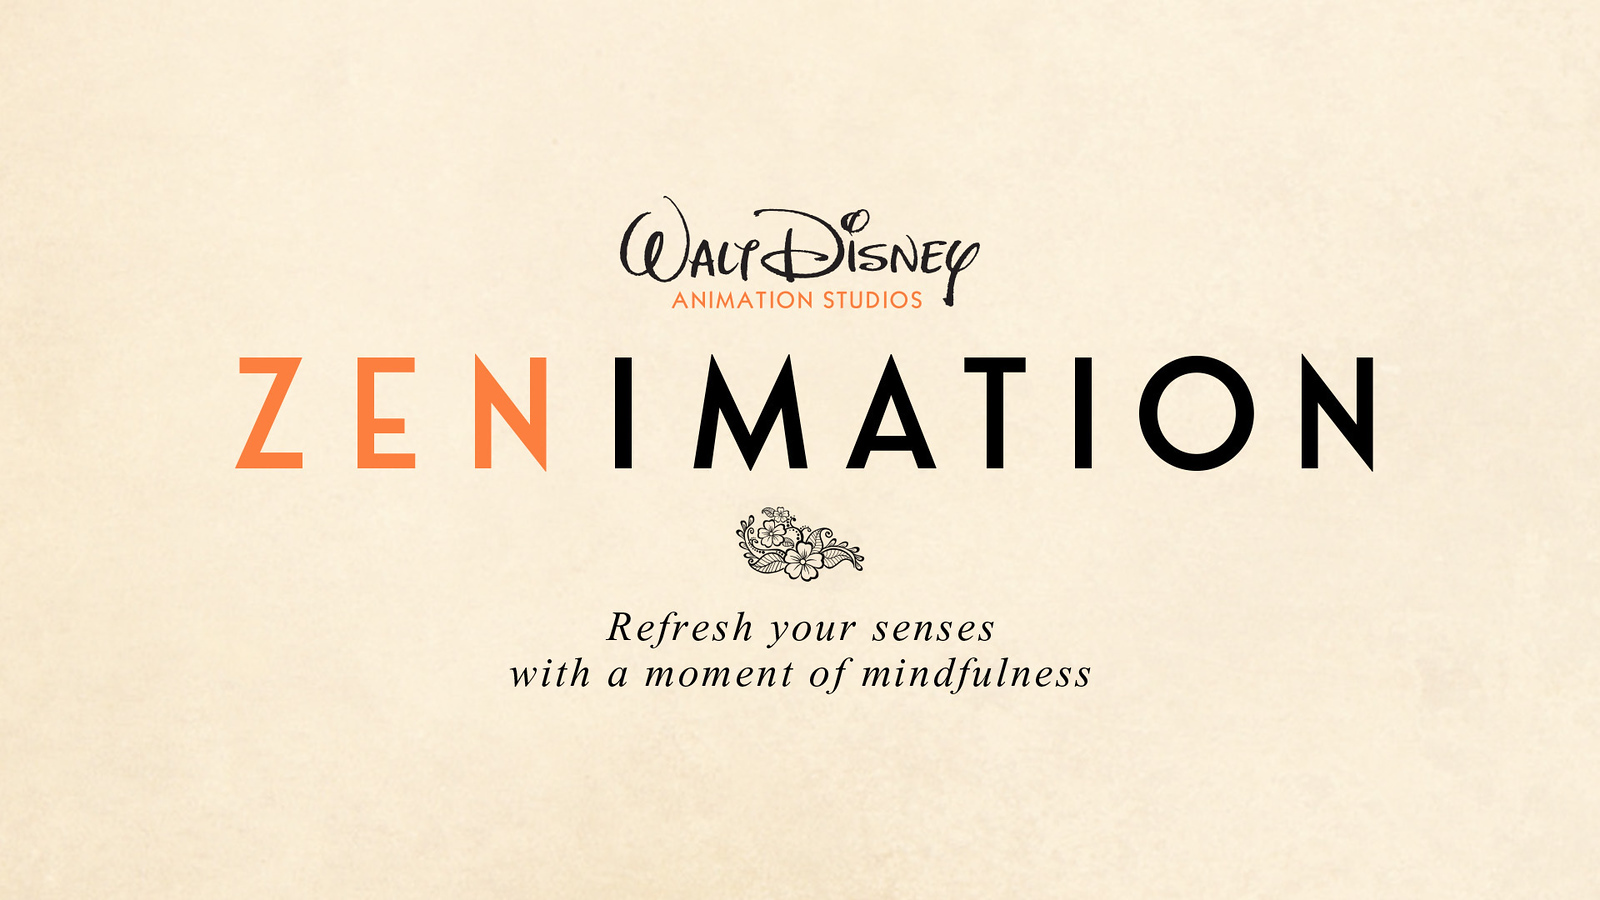 zenimation walt disney animation studios logo